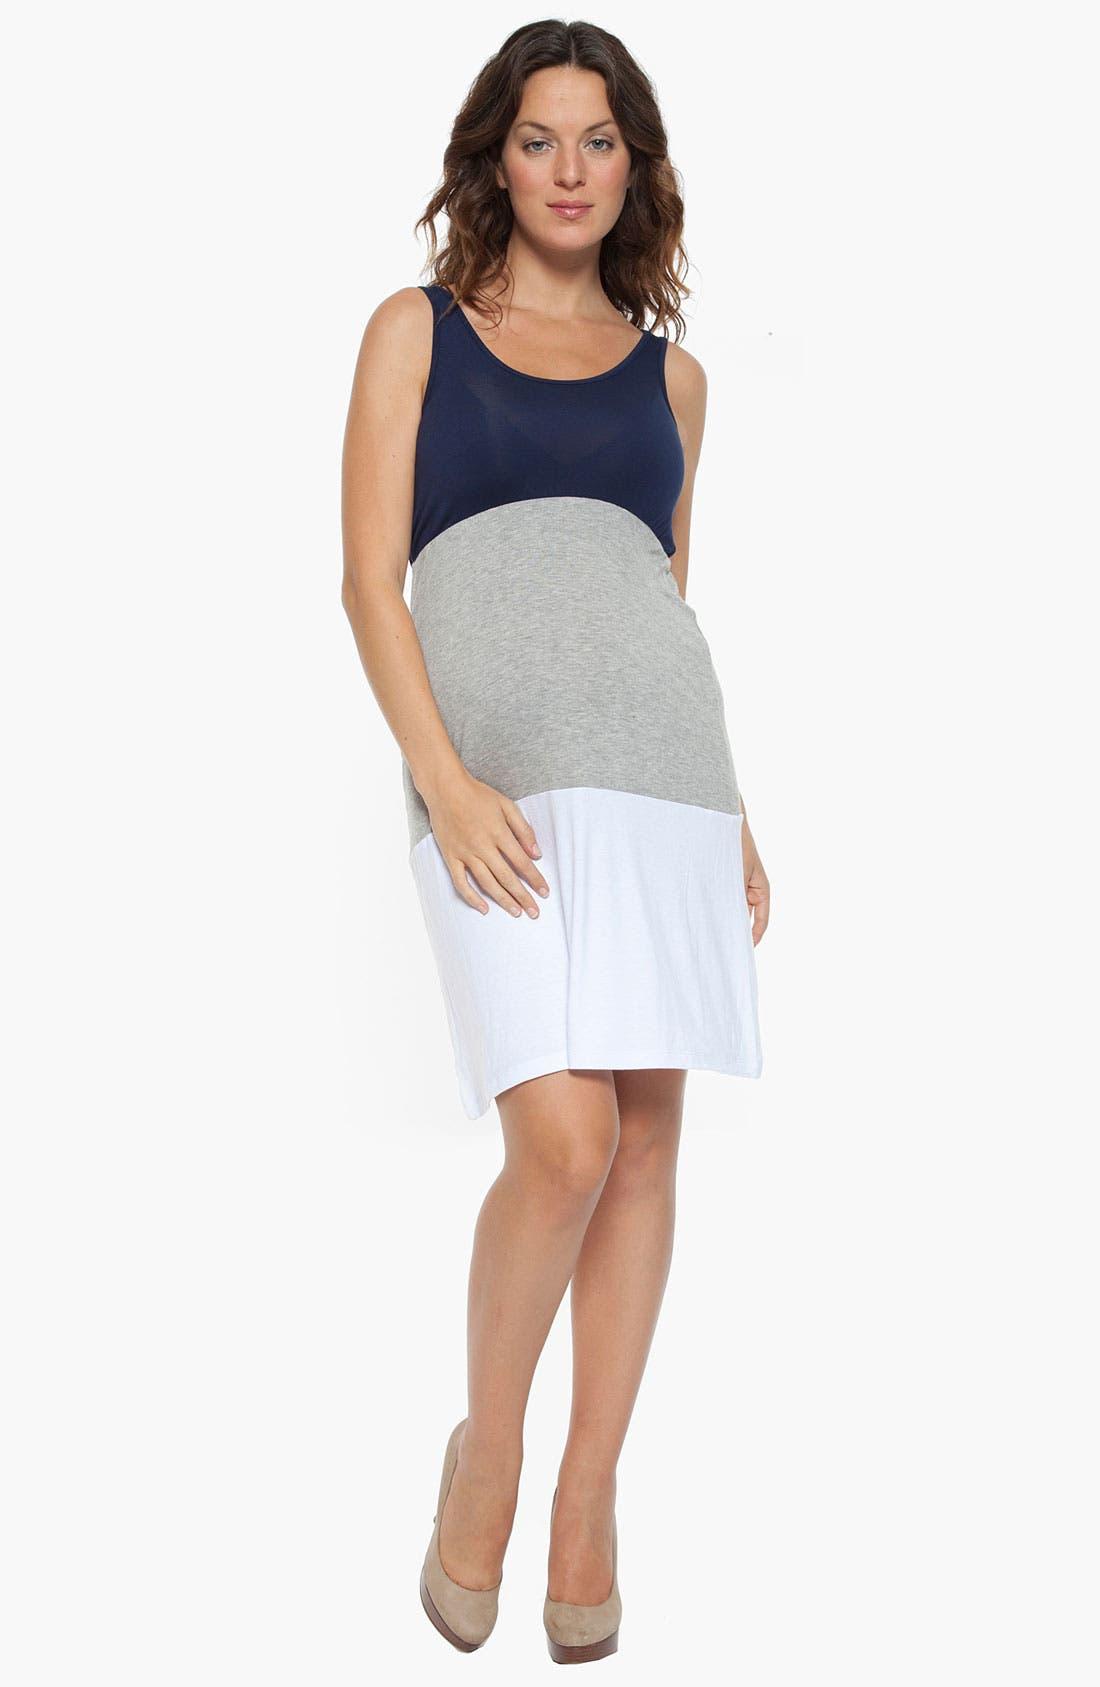 Alternate Image 1 Selected - Nom Maternity 'Cece' Maternity Tank Dress